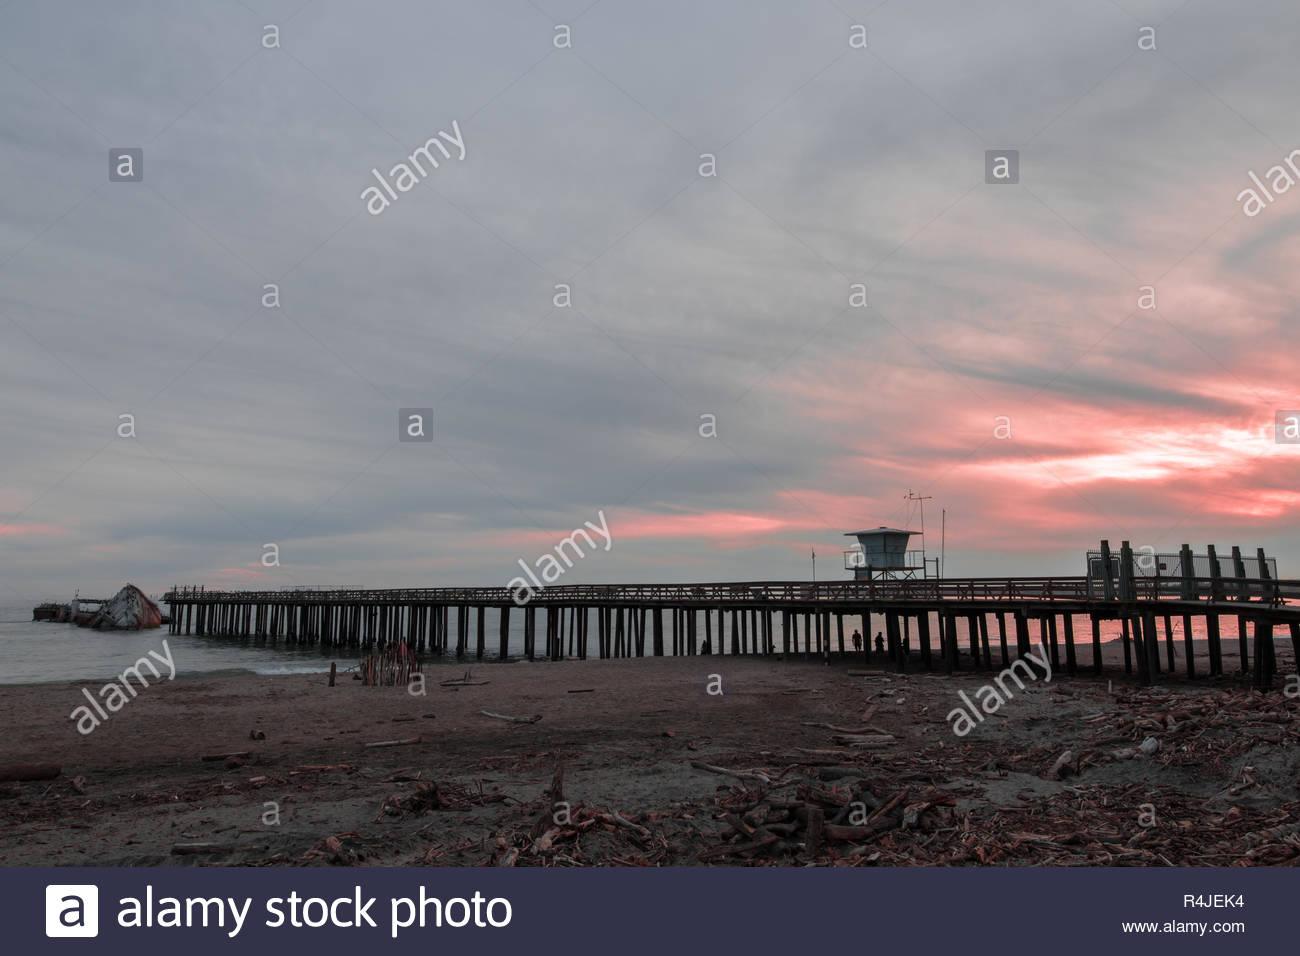 Seacliff State Beach, Aptos, Santa Cruz County, California USA. - Stock Image